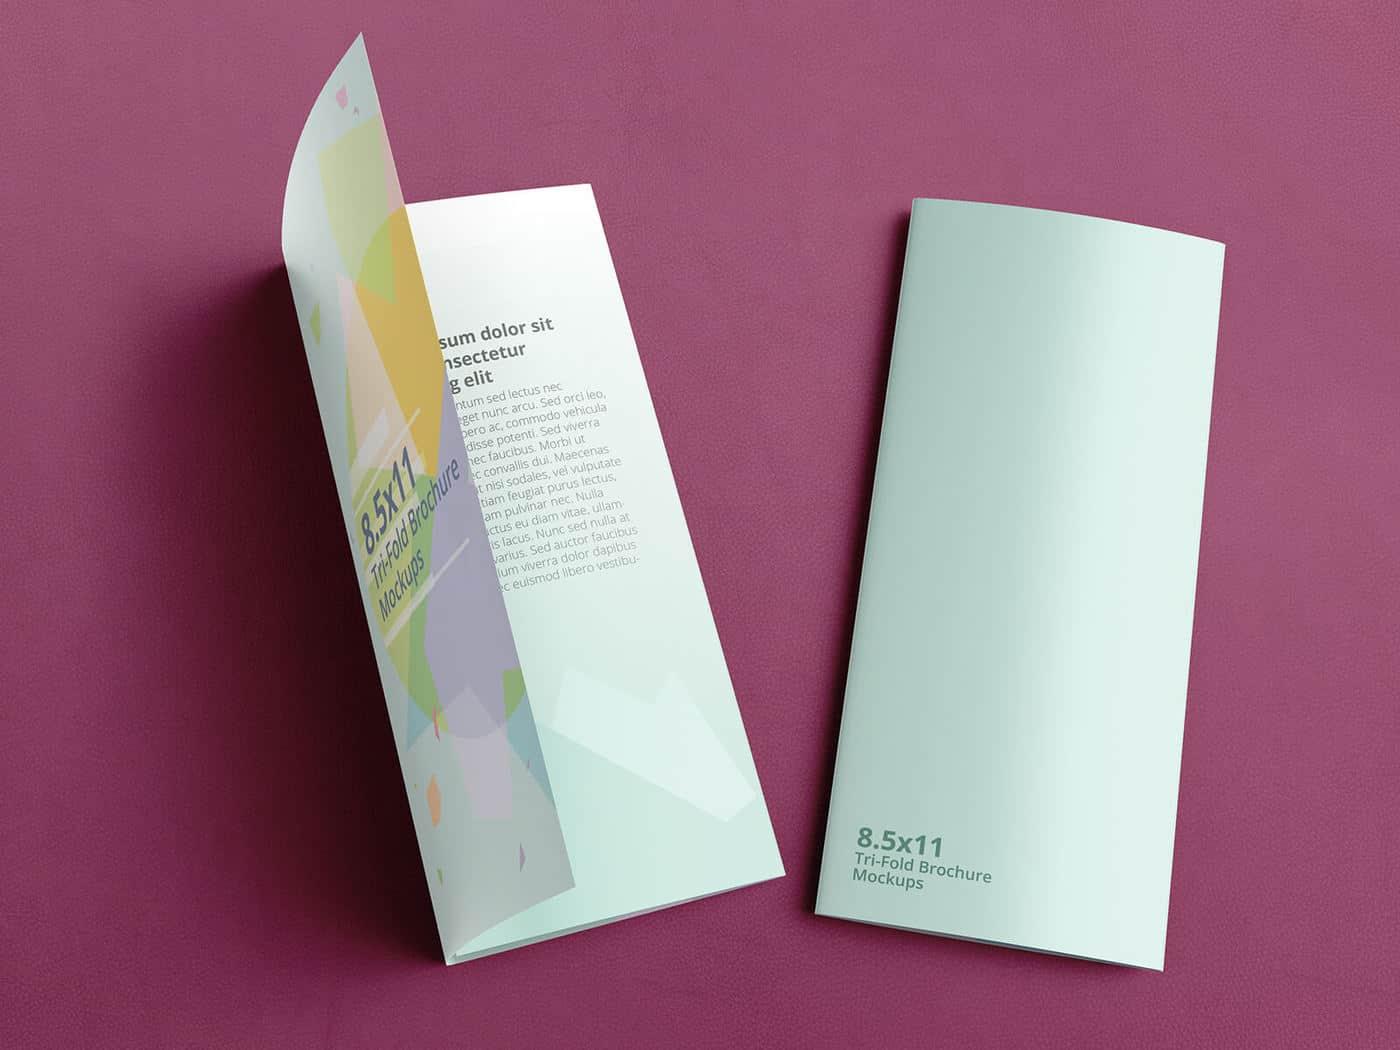 Trifold Brochure Mockups 8.5x11 size